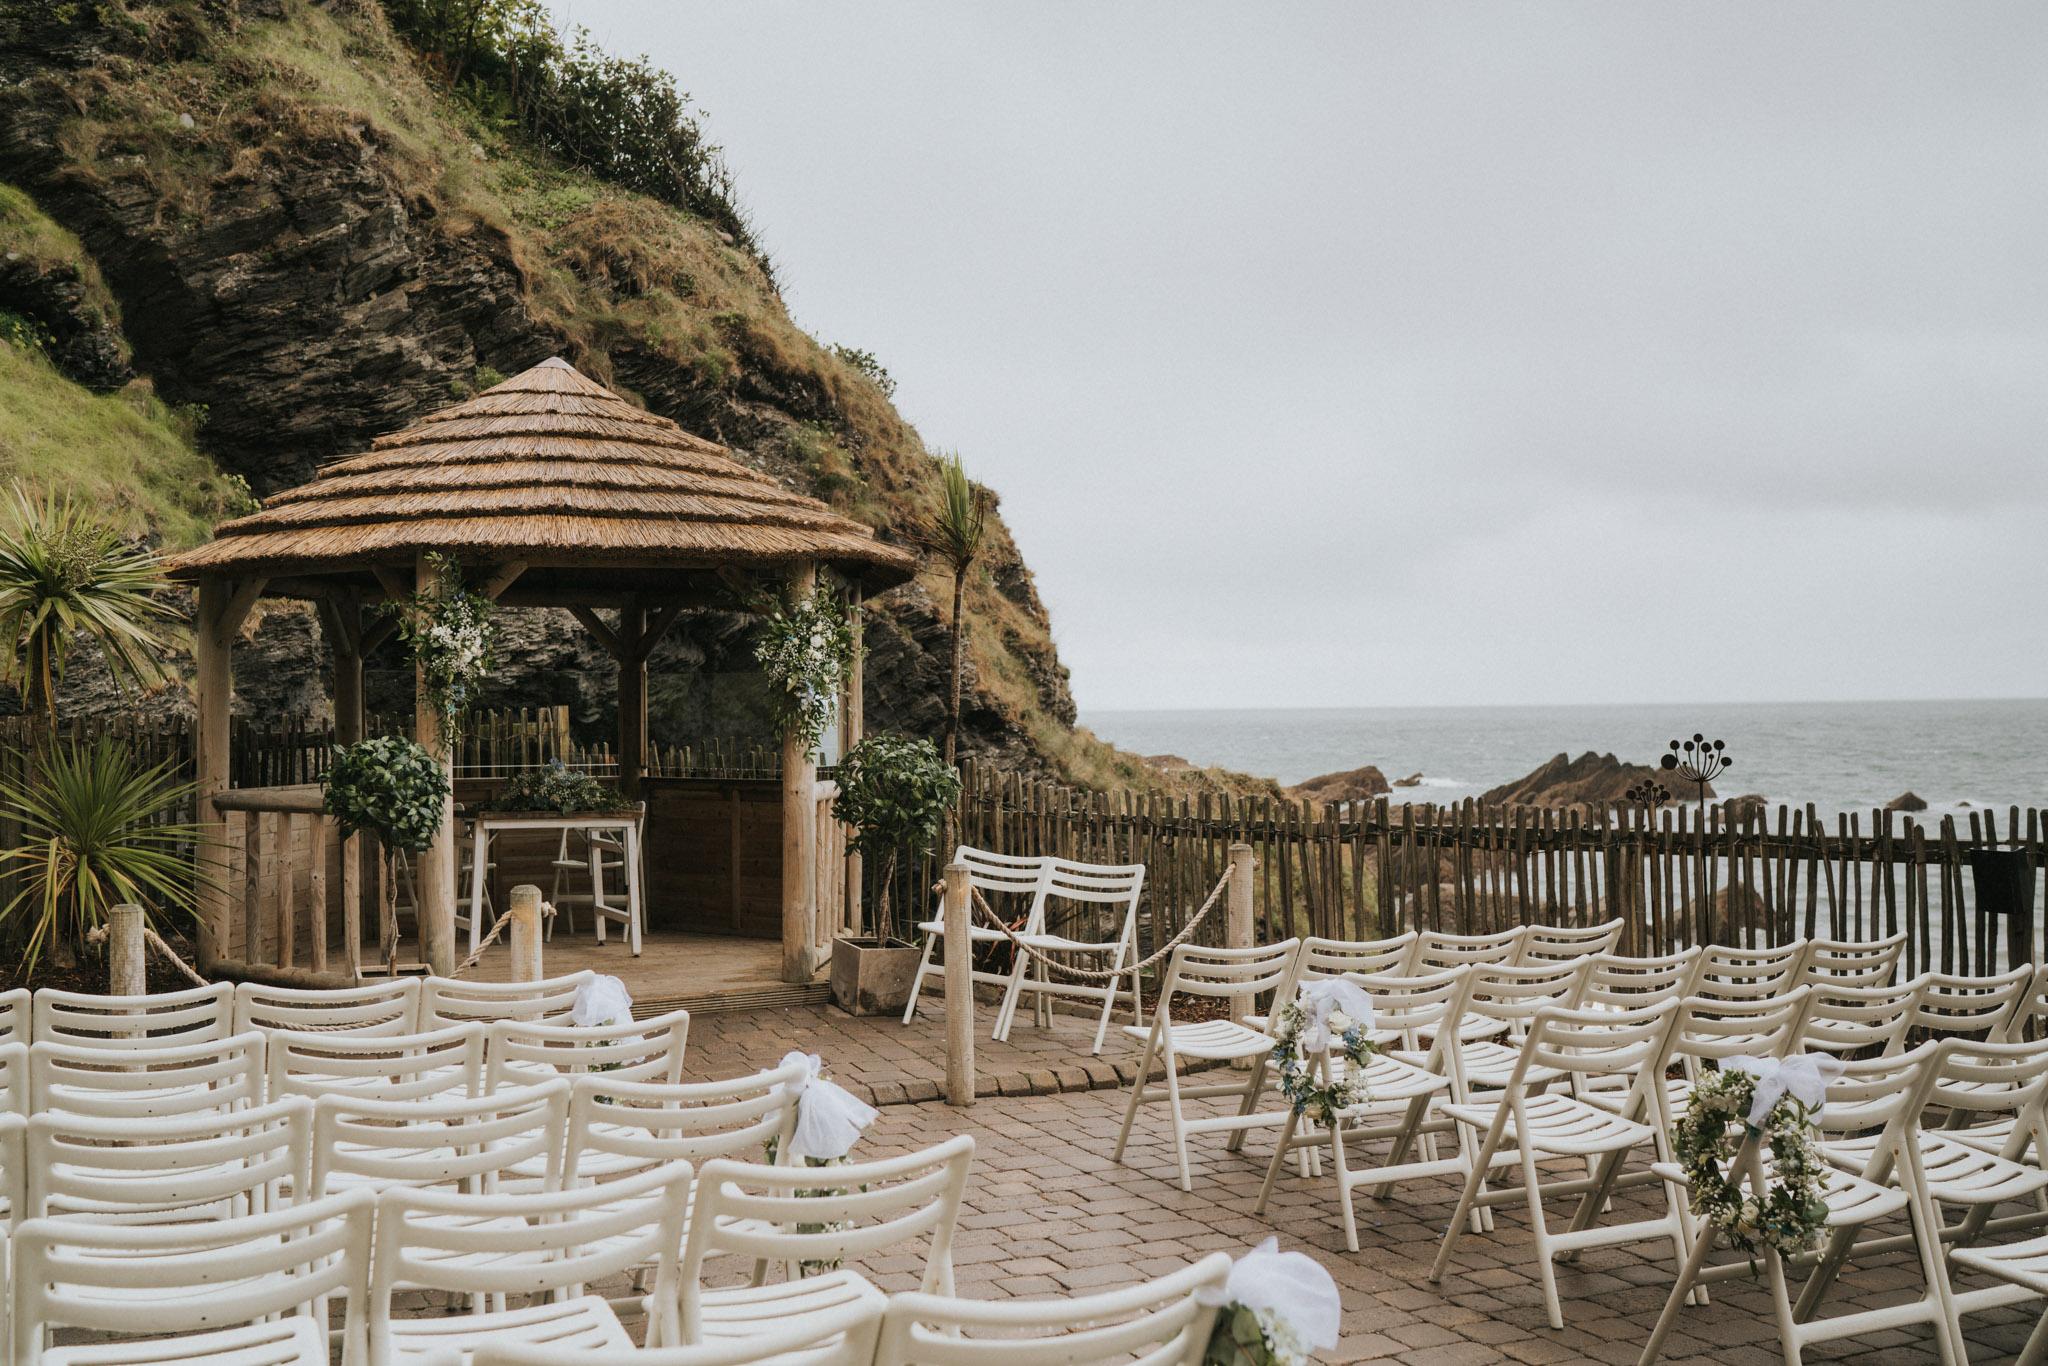 John-Amy-Tunnels-Beaches-Ilfracombe-Devon-Outdoor-Wedding-UK-Colchester-Essex-Alternative-Wedding-Photographer-Grace-Elizabeth (7 of 31).jpg